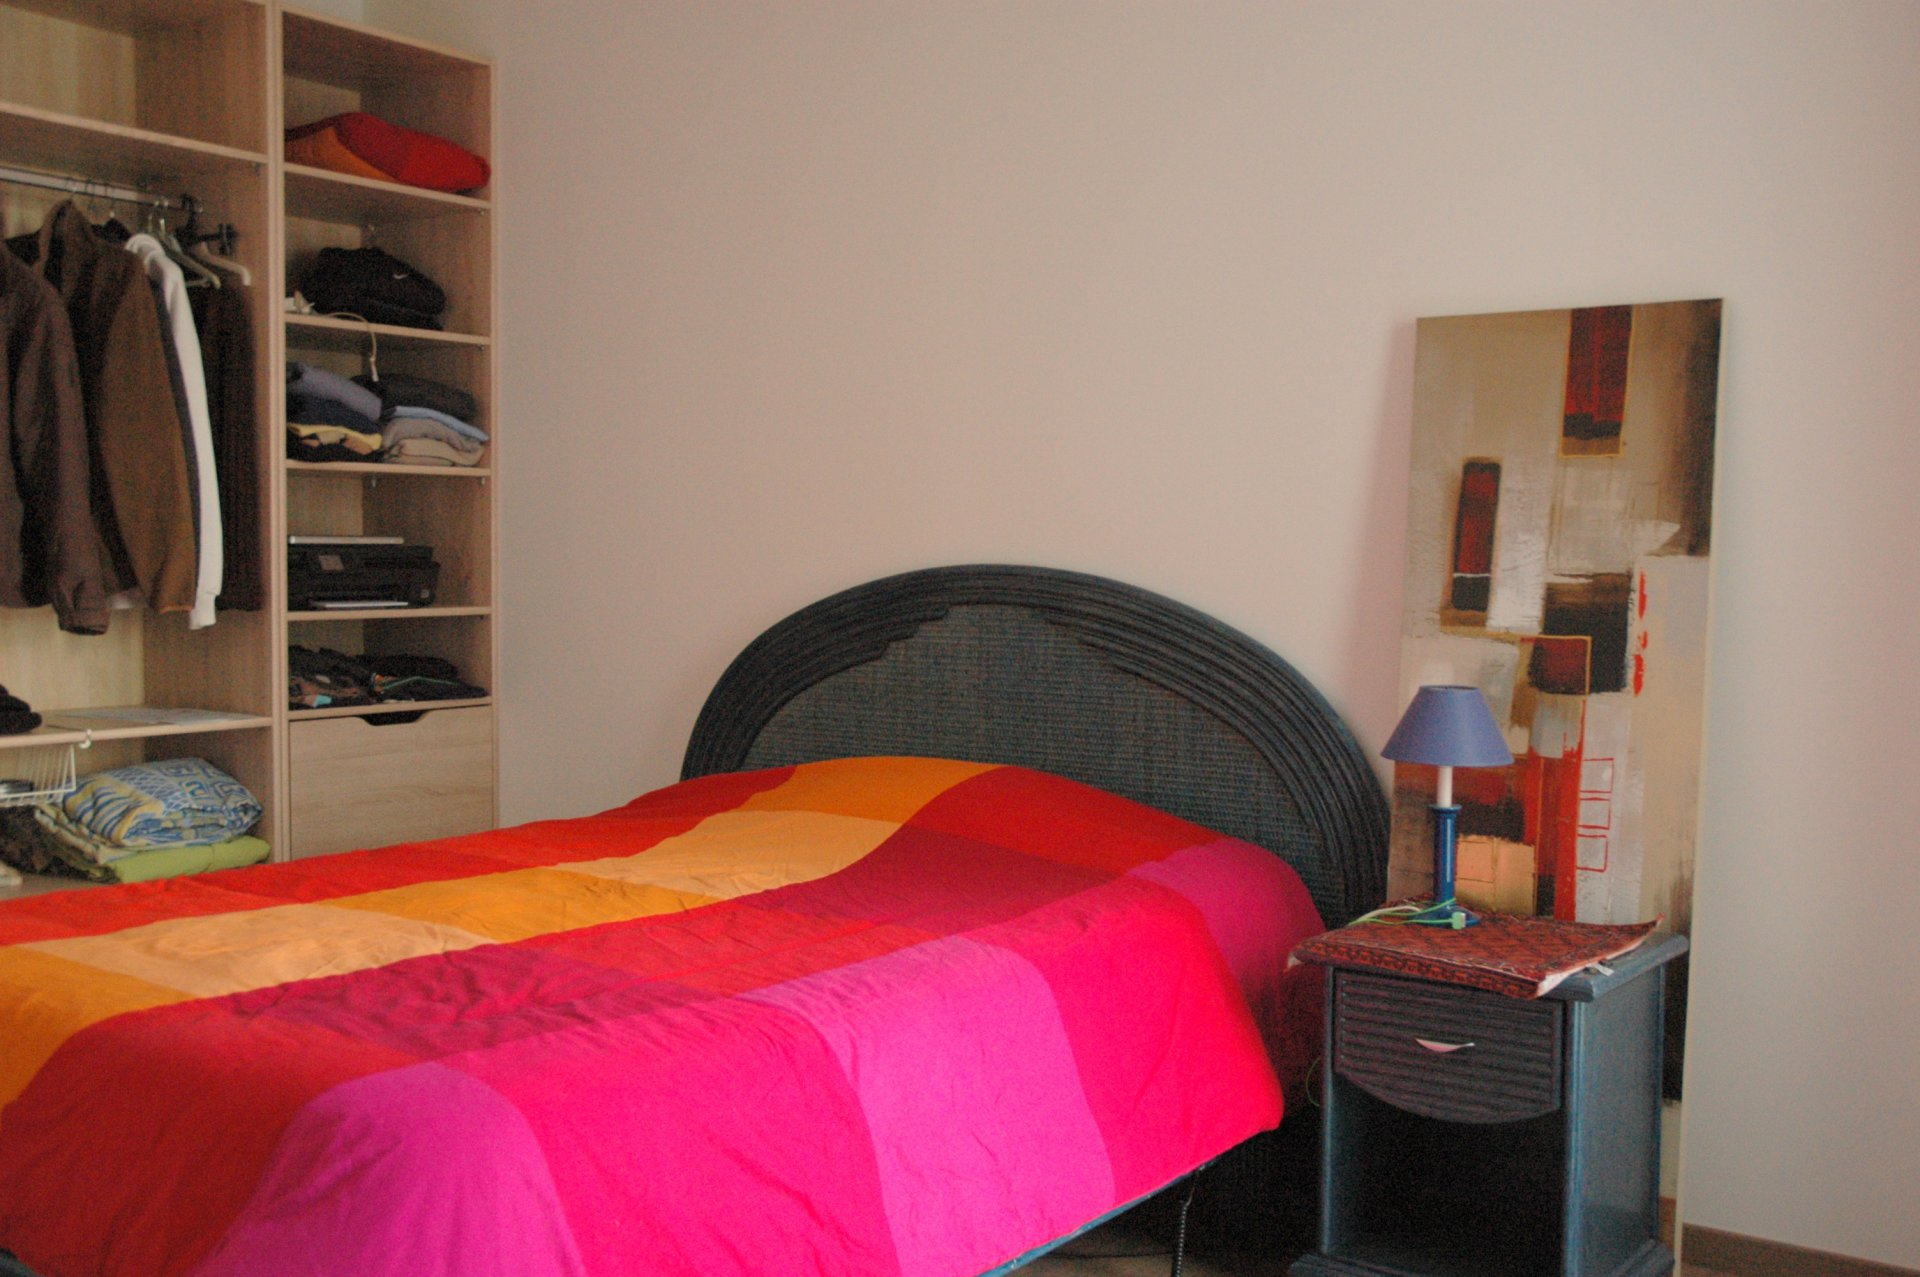 2 bedroom apartment, Saint-Julien-En-Genevois